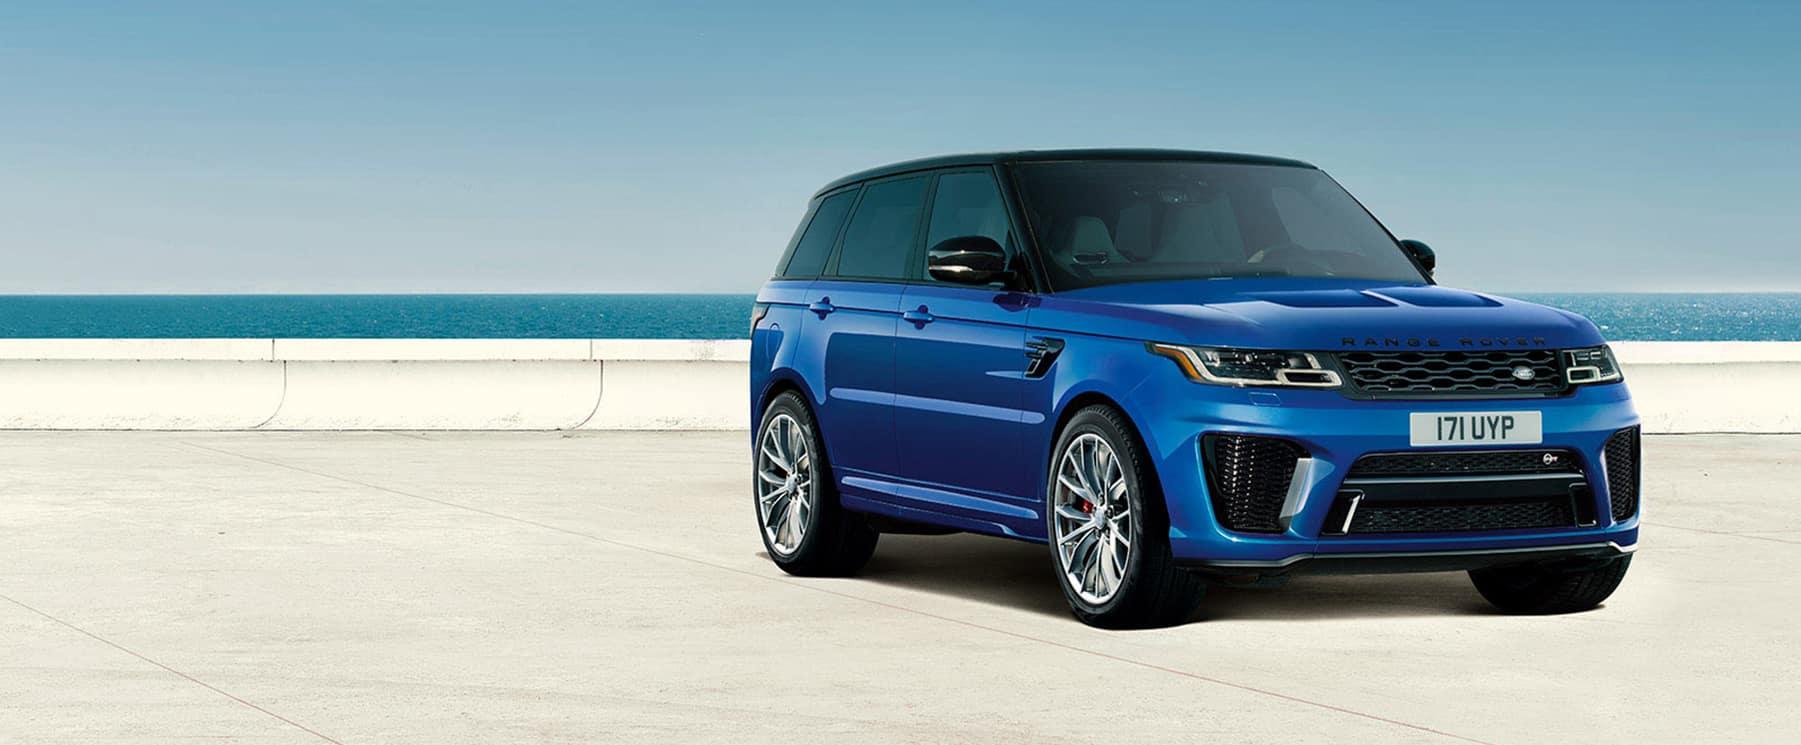 Range Rover Sport SVR Overview